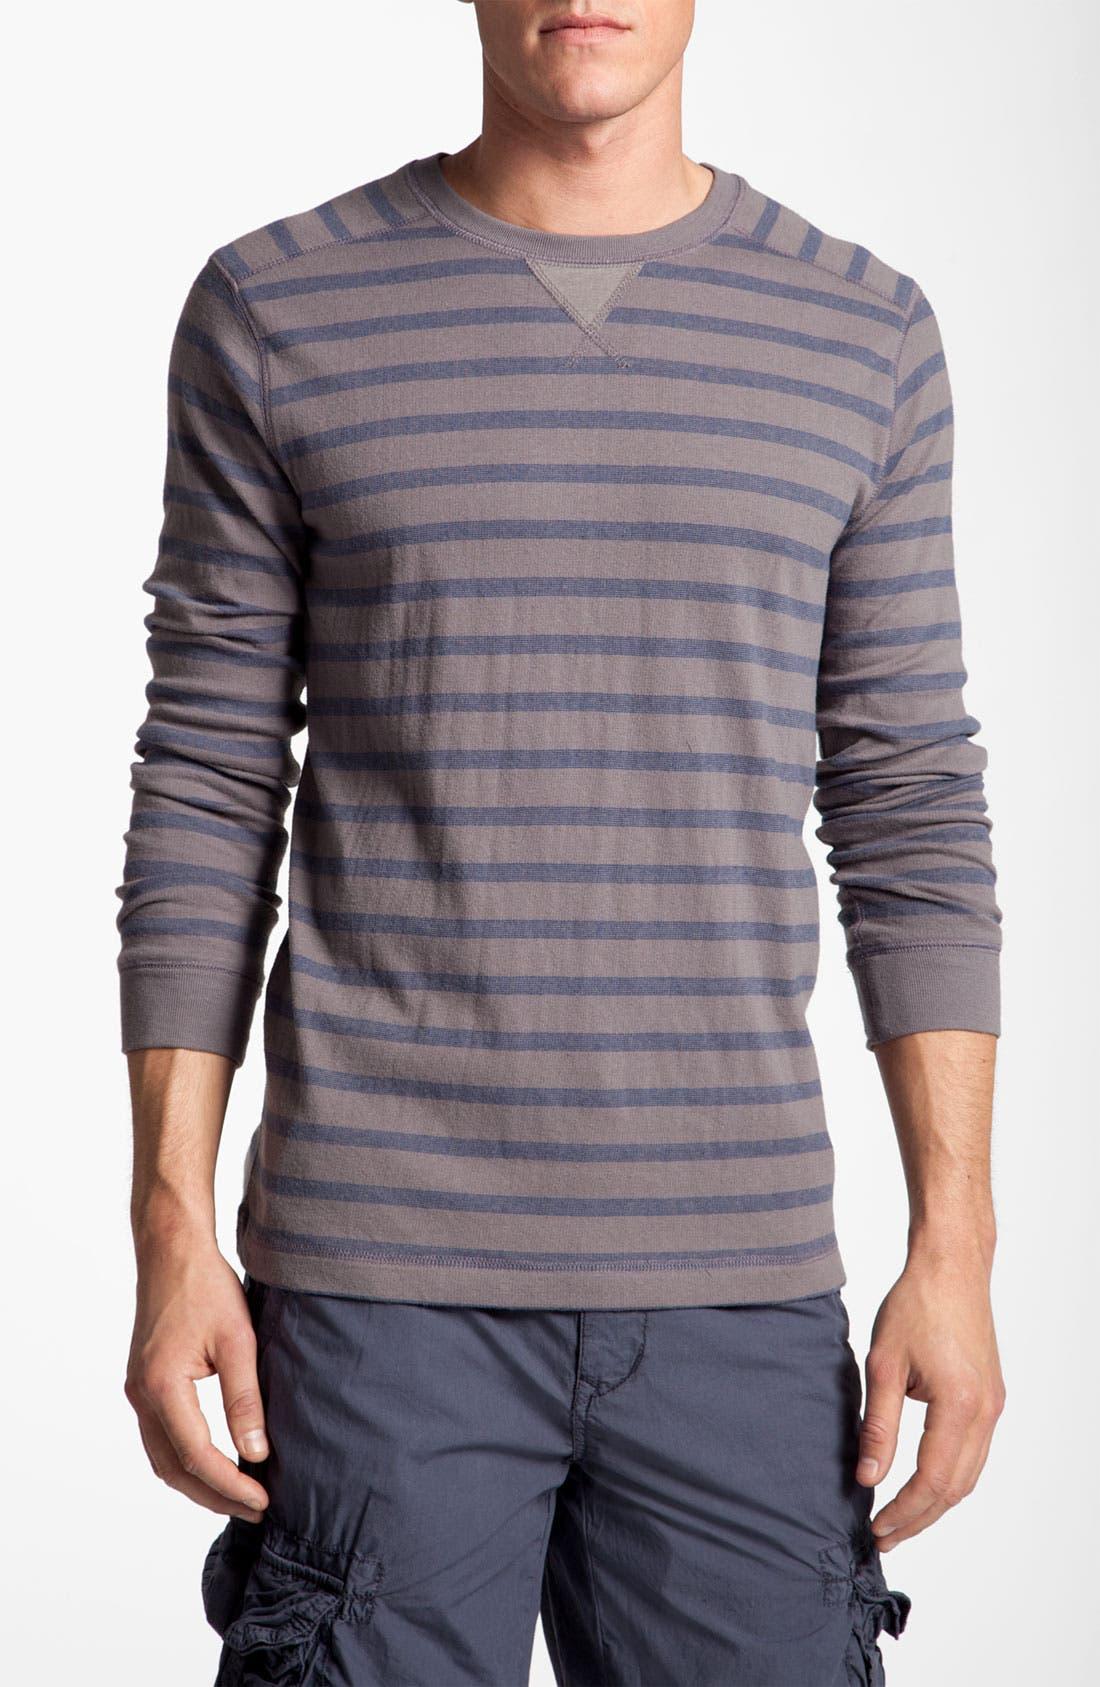 Main Image - Quiksilver Knit Crewneck T-Shirt